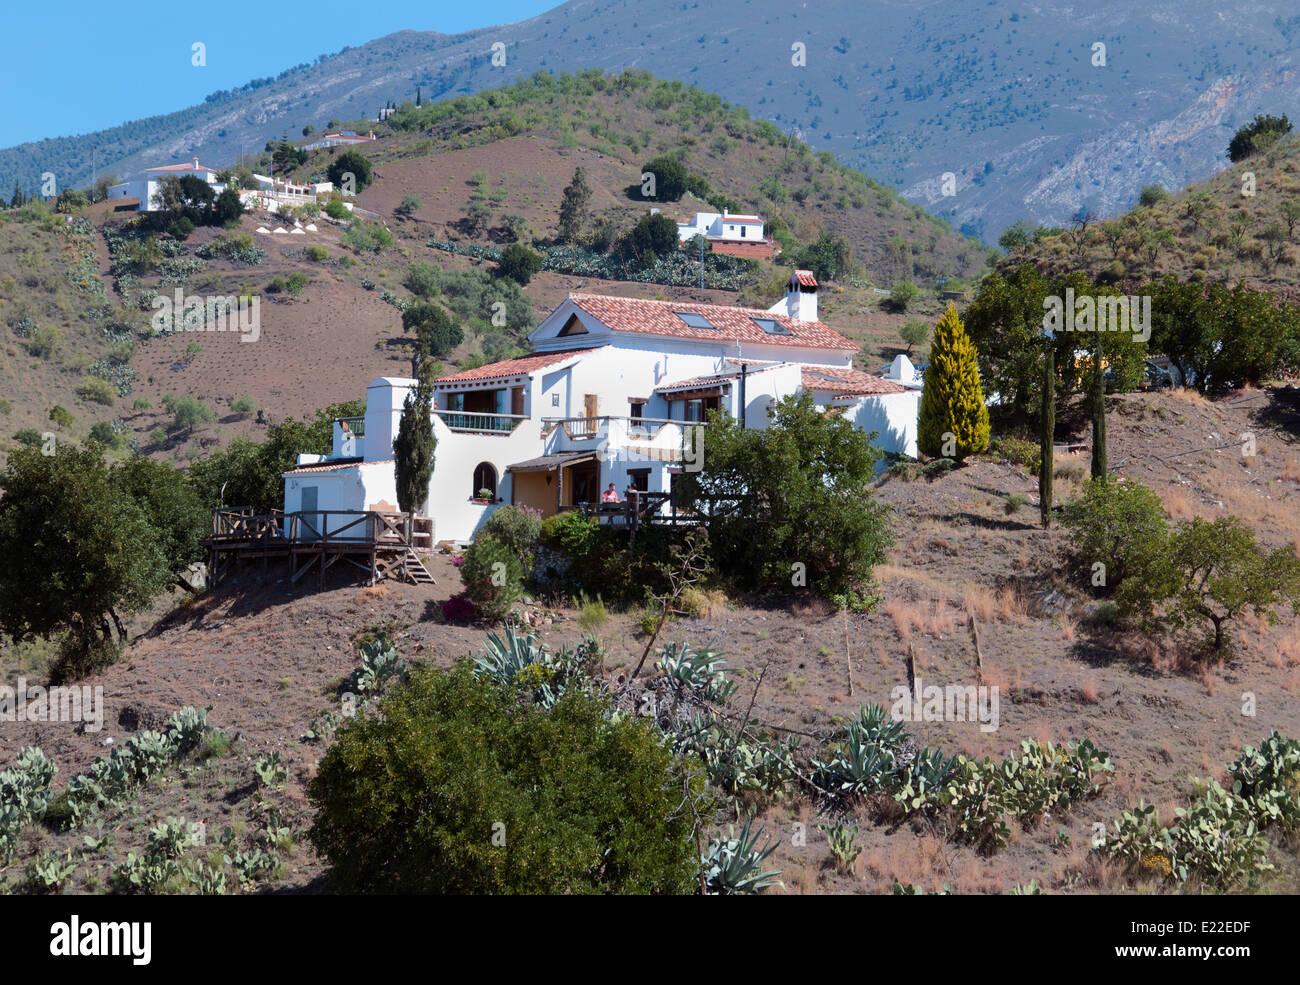 Canillas De Aceituno Malaga Spain Spanish White House Villa Estate